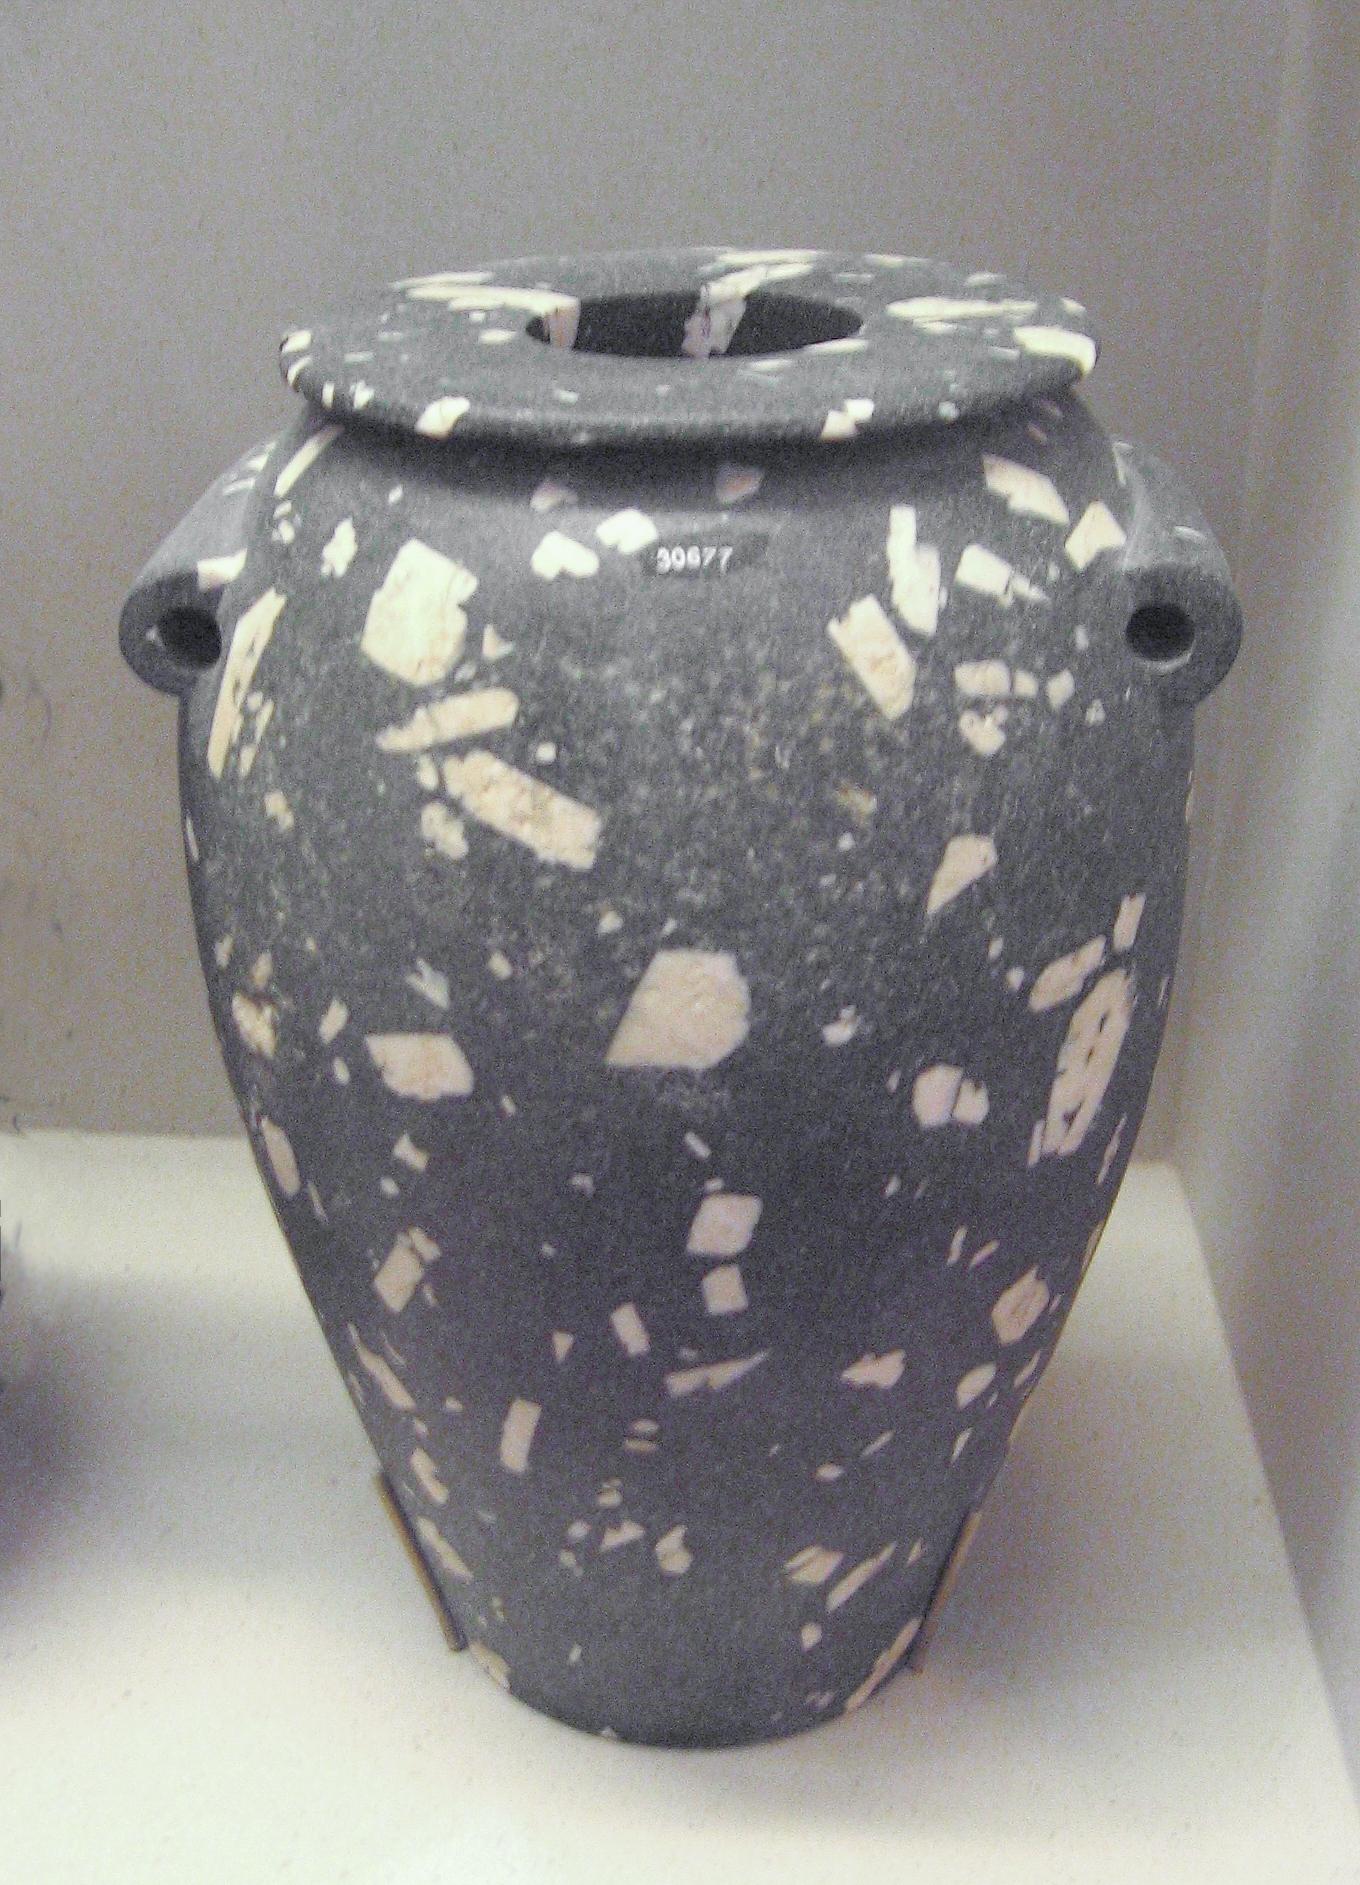 http://upload.wikimedia.org/wikipedia/commons/c/c4/Diorite_Vase_Neqada_II_Predynastic_Ancient_Egypt_Field_Museum.jpg